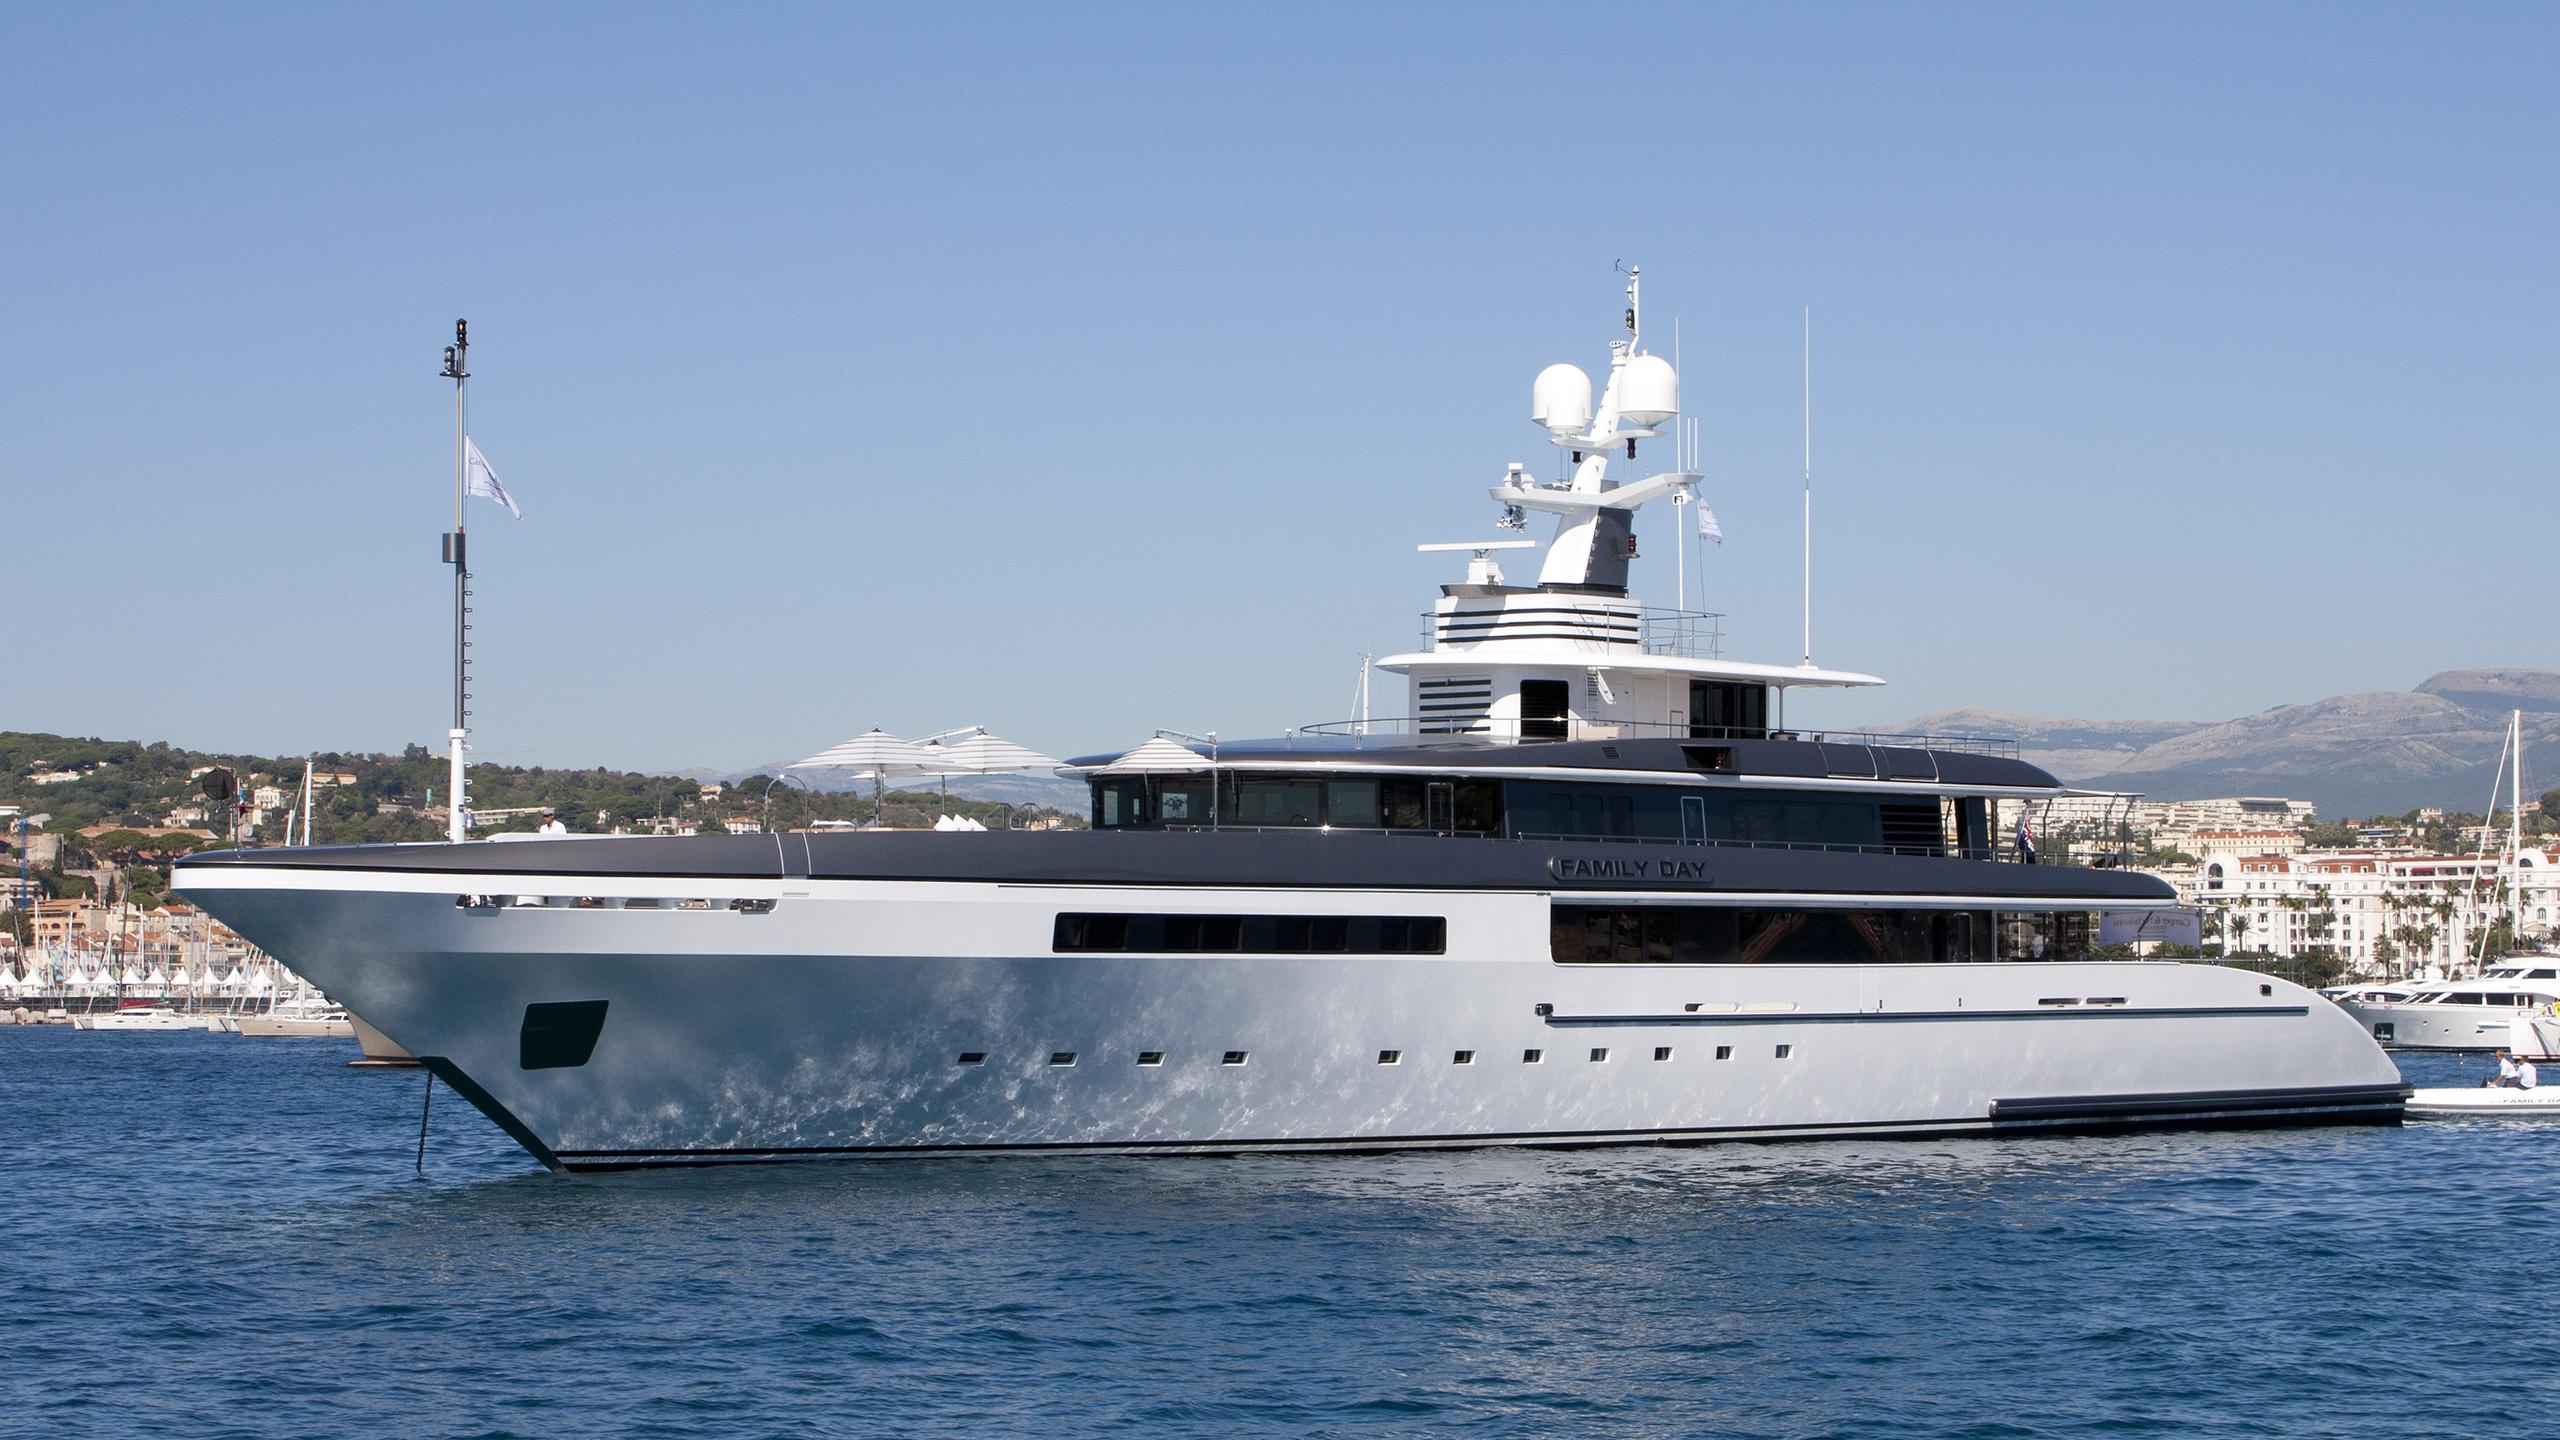 eternity-motoryacht-codecasa-2010-65m-half-profile